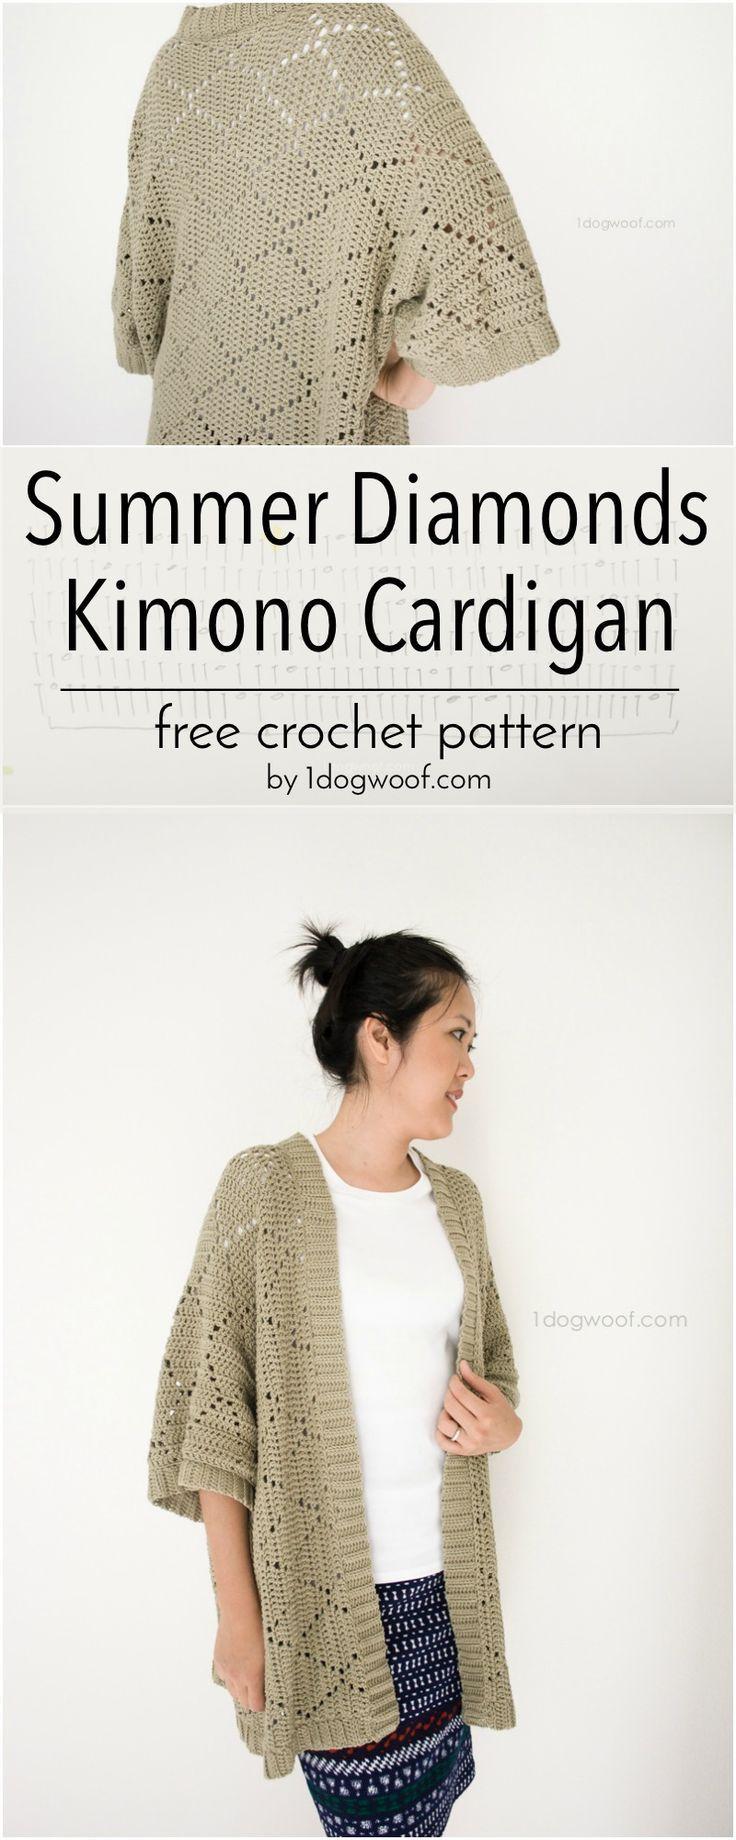 Free crochet pattern for a light summer cardigan, featuring a simple diamond motif. | http://1dogwoof.com